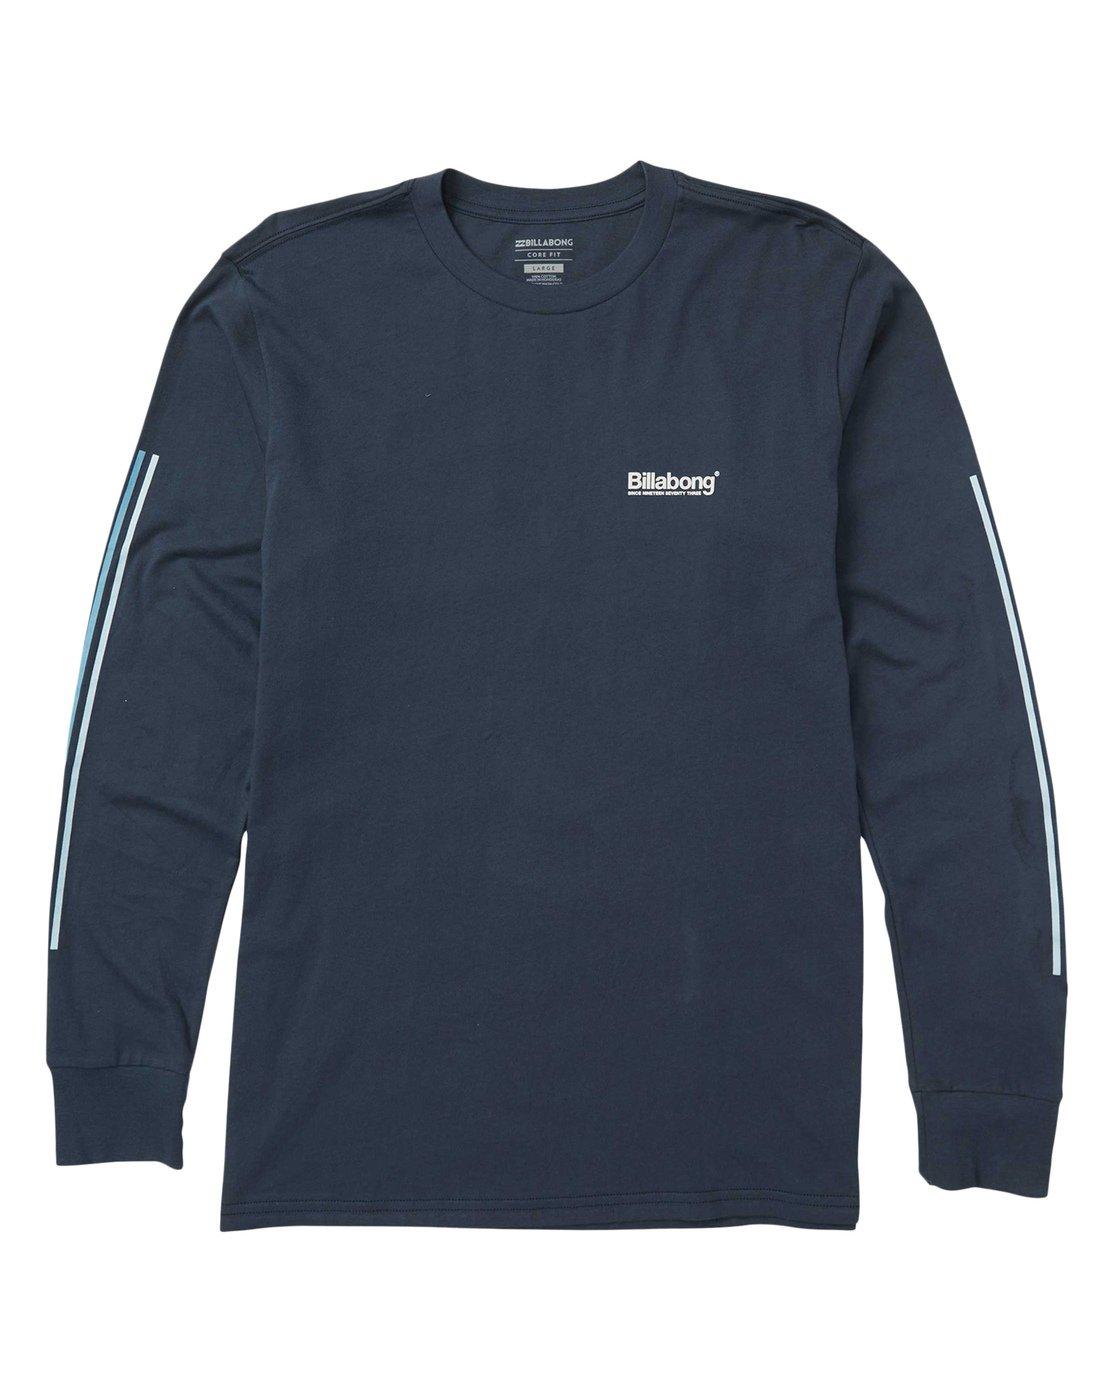 0 Pacific Long Sleeve Graphic Tee Shirt Blue M405SBPA Billabong 30193e01efc